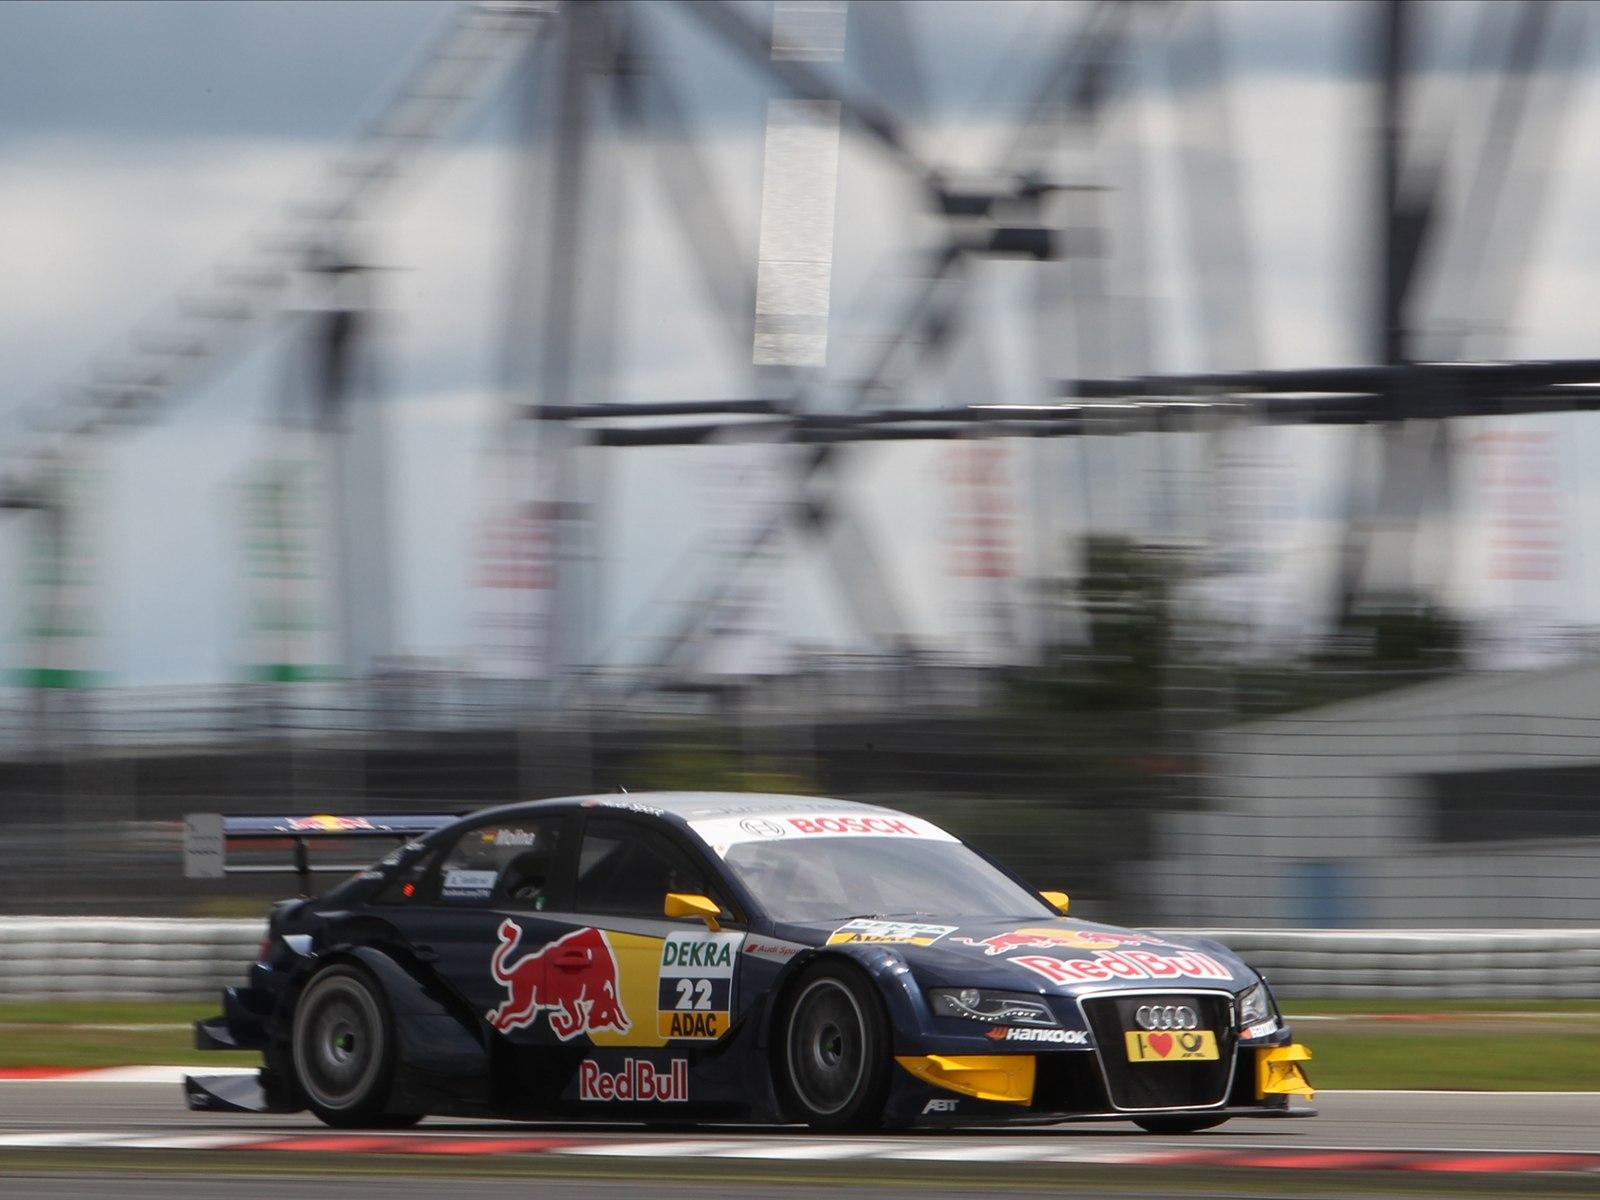 http://4.bp.blogspot.com/-G7MQAyEIRio/TkrrGPJqiWI/AAAAAAAAD7o/4_fQOdkL1aE/s1600/Audi+A4+DTM+2011+03.jpg